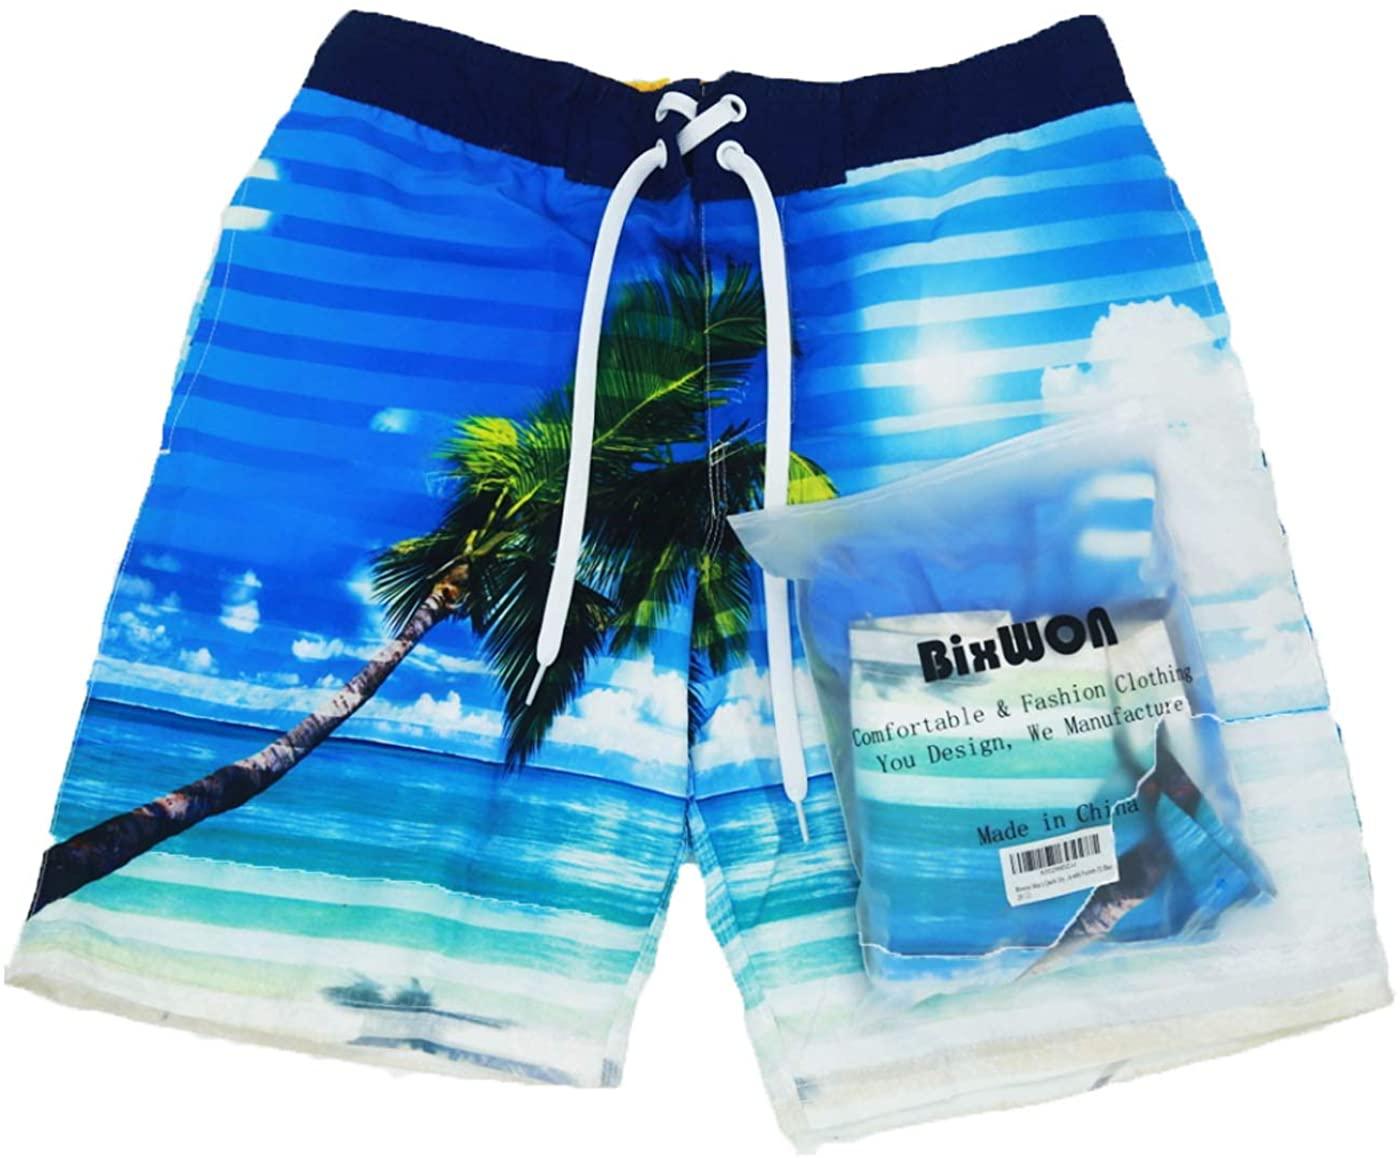 Bixwon Men's Quick Dry Swim Trunks Swimwear Bathing Suits with Pockets Beach Shorts